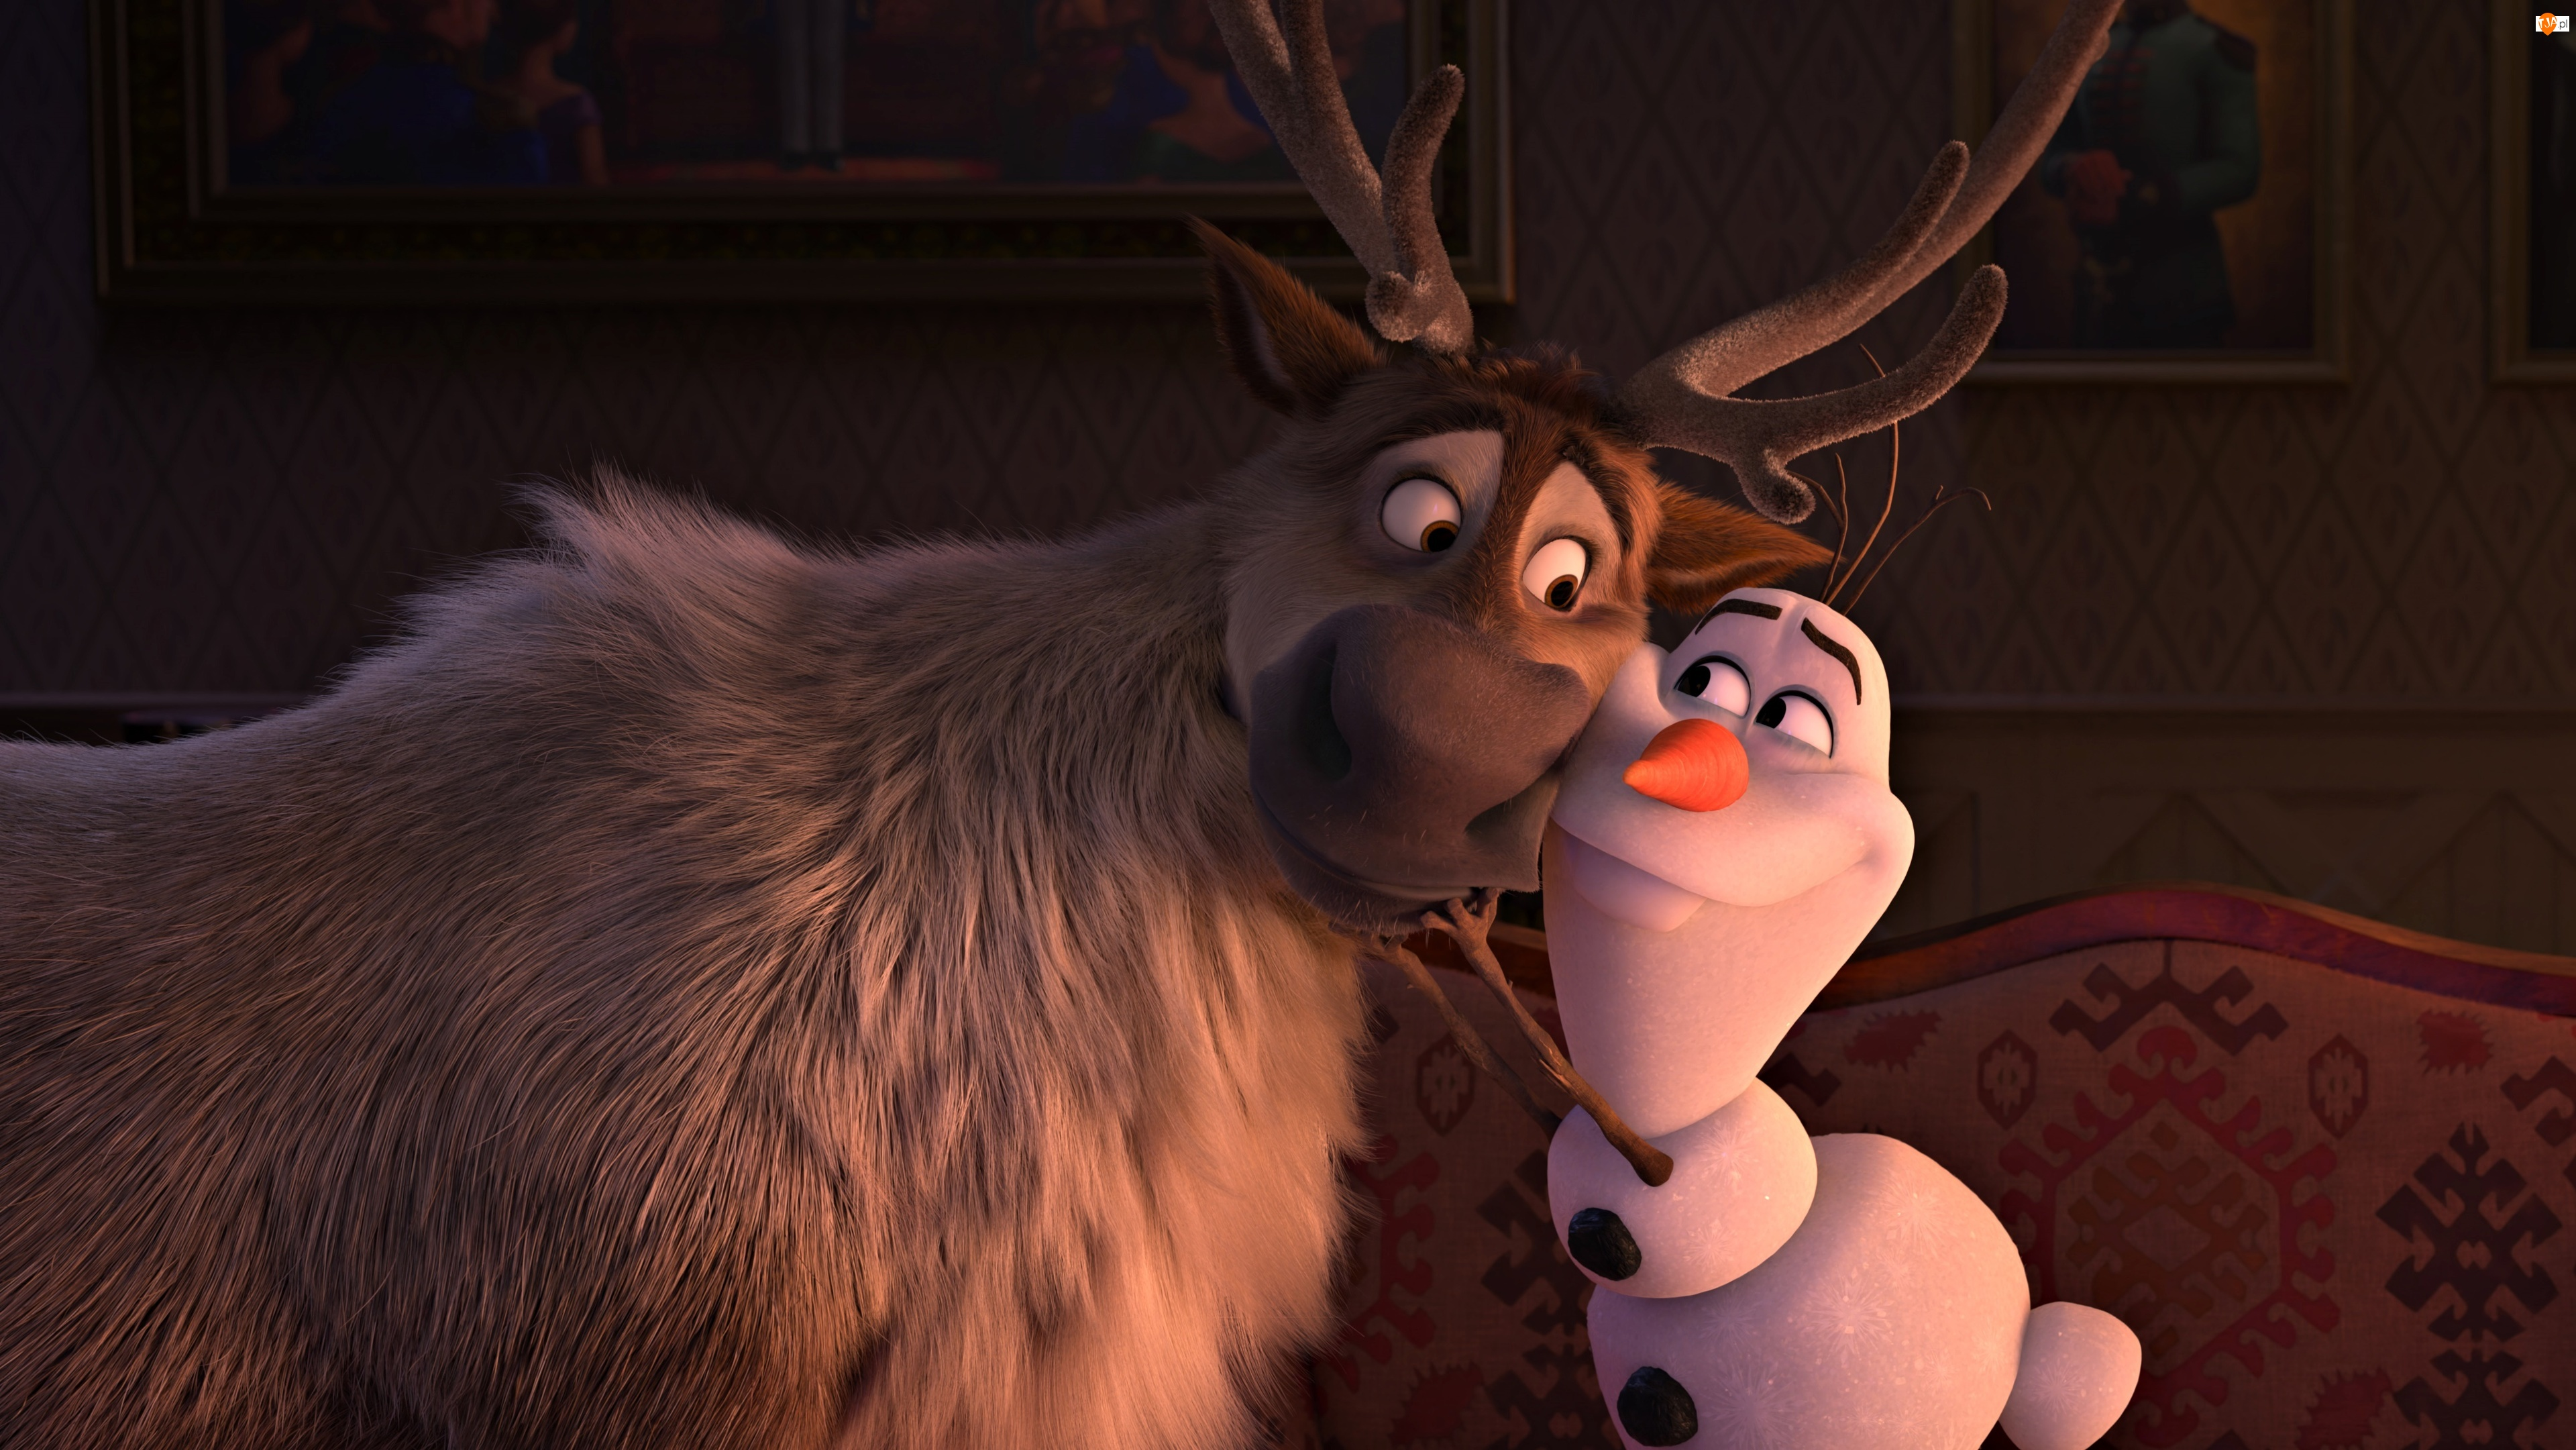 Frozen 2, Bałwanek Olaf, Kraina Lodu 2, Film animowany, Renifer Sven